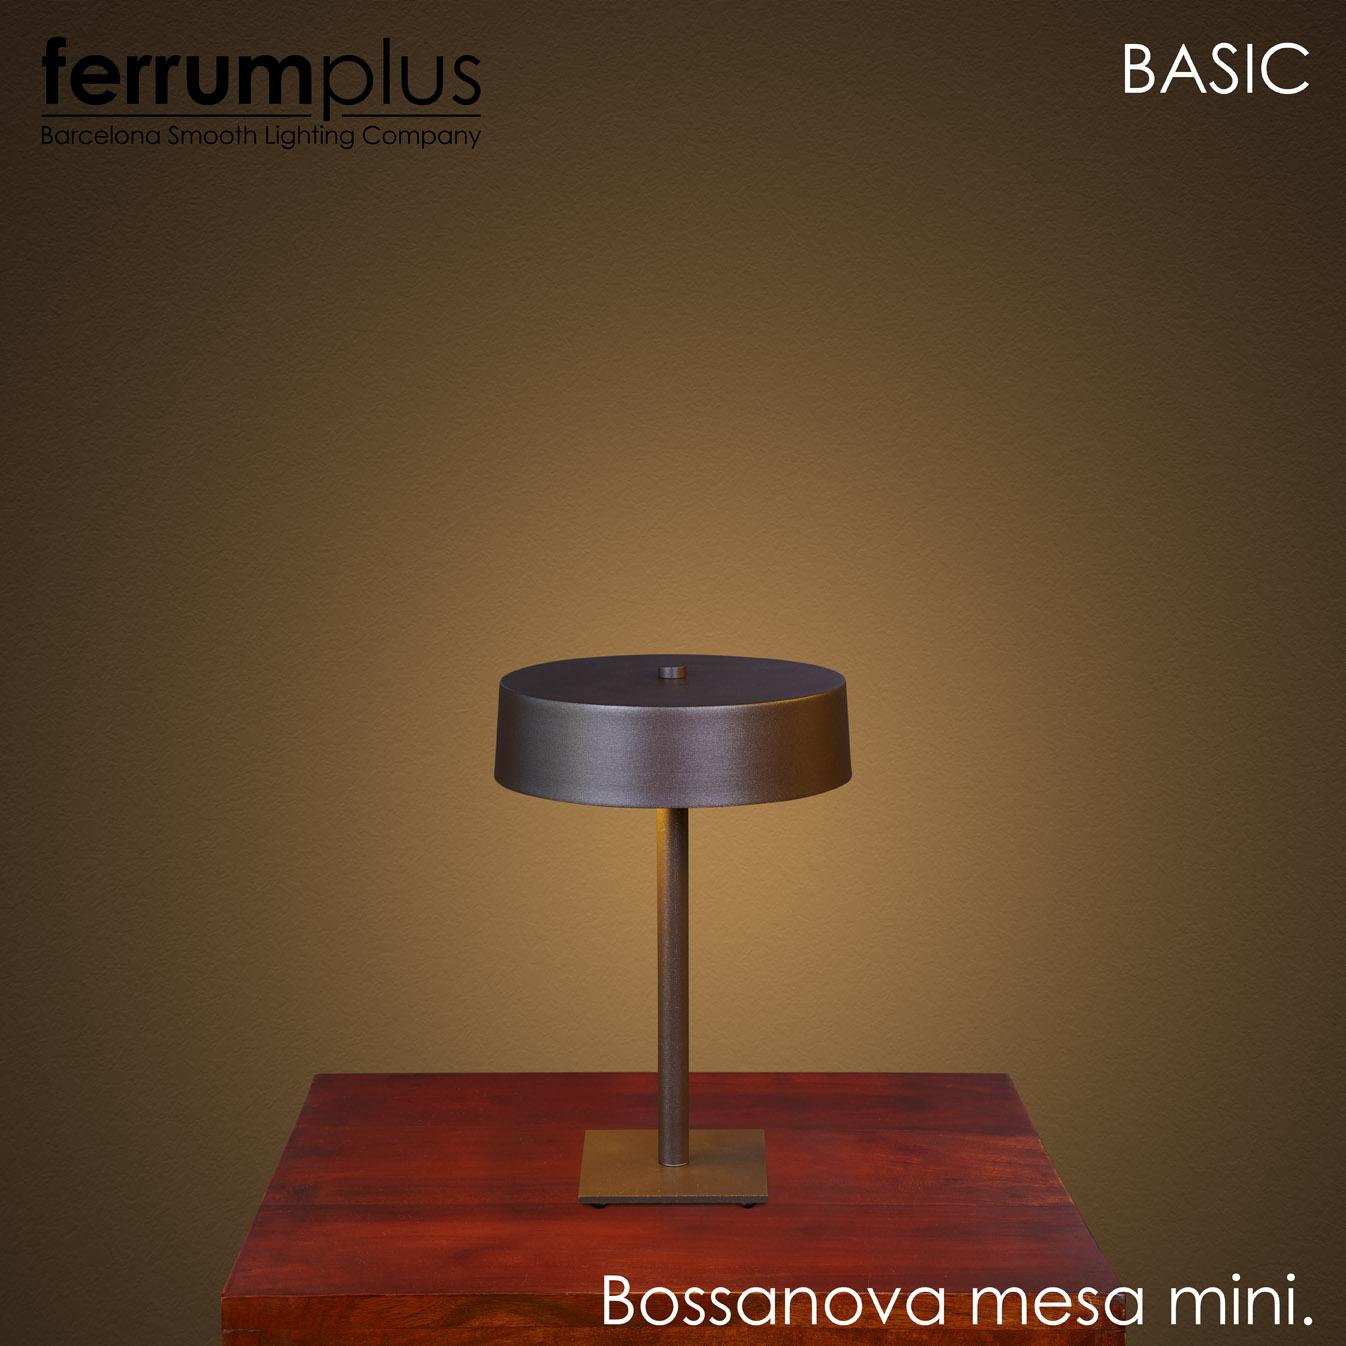 Bossanova sobremesa mini tienda lamparas barcelona alda - Pantallas lamparas barcelona ...